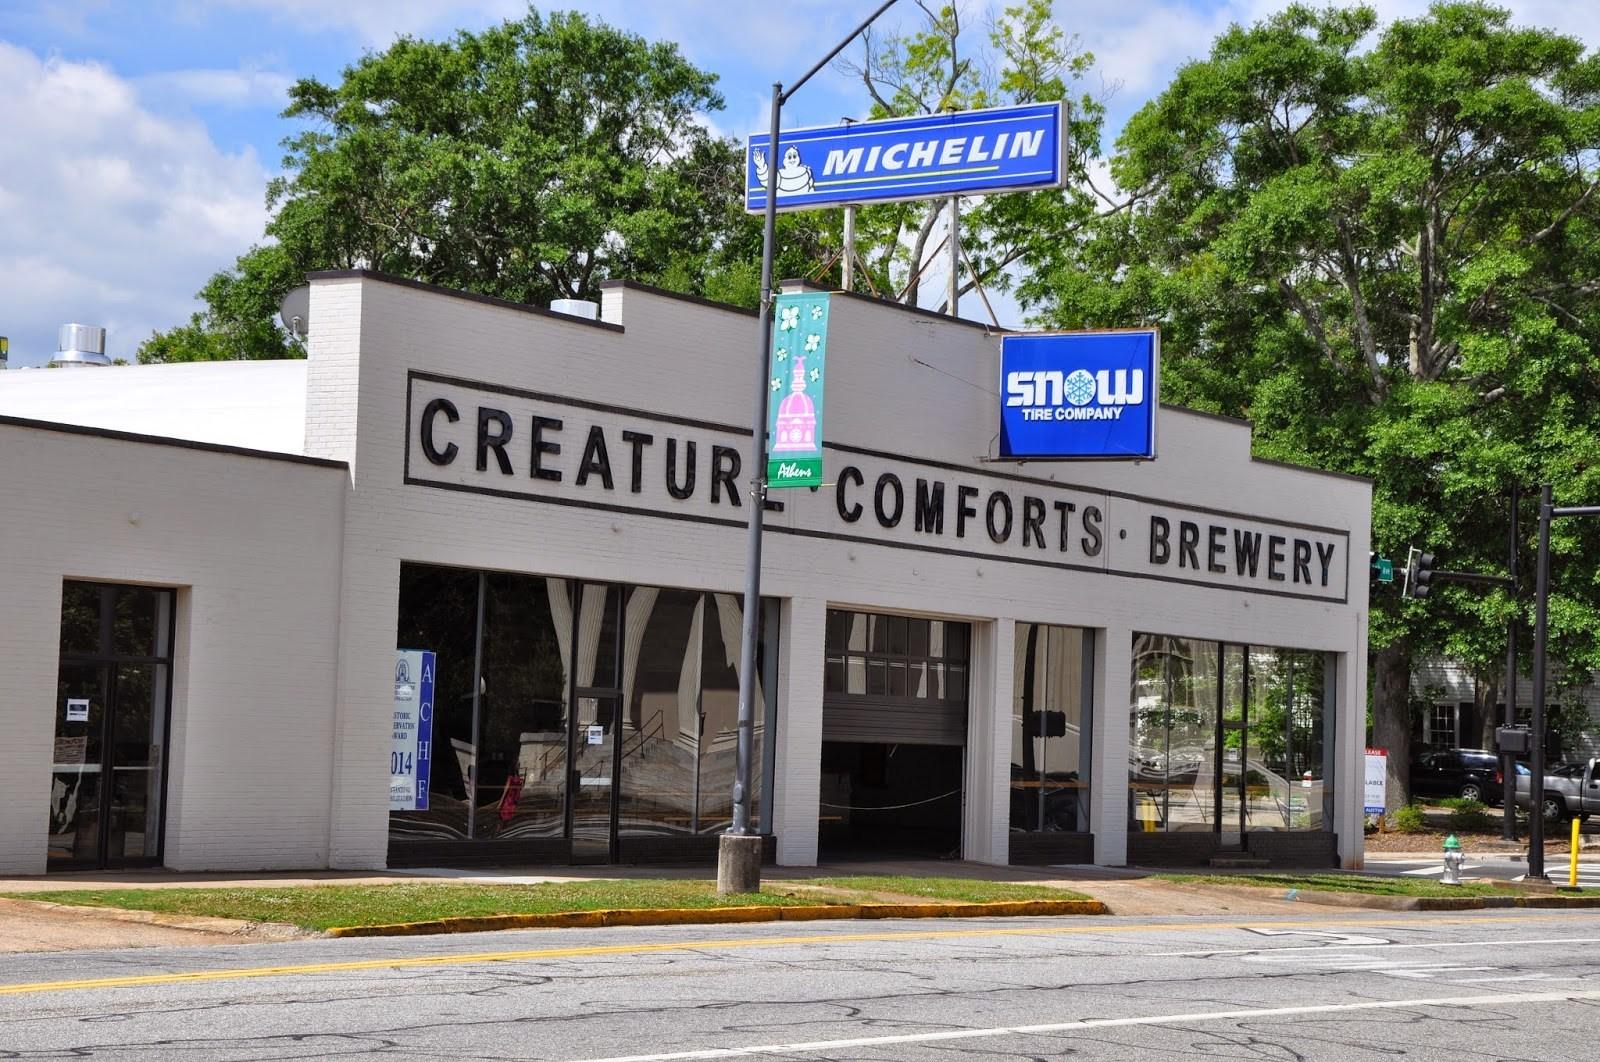 creature-comforts-72.jpg